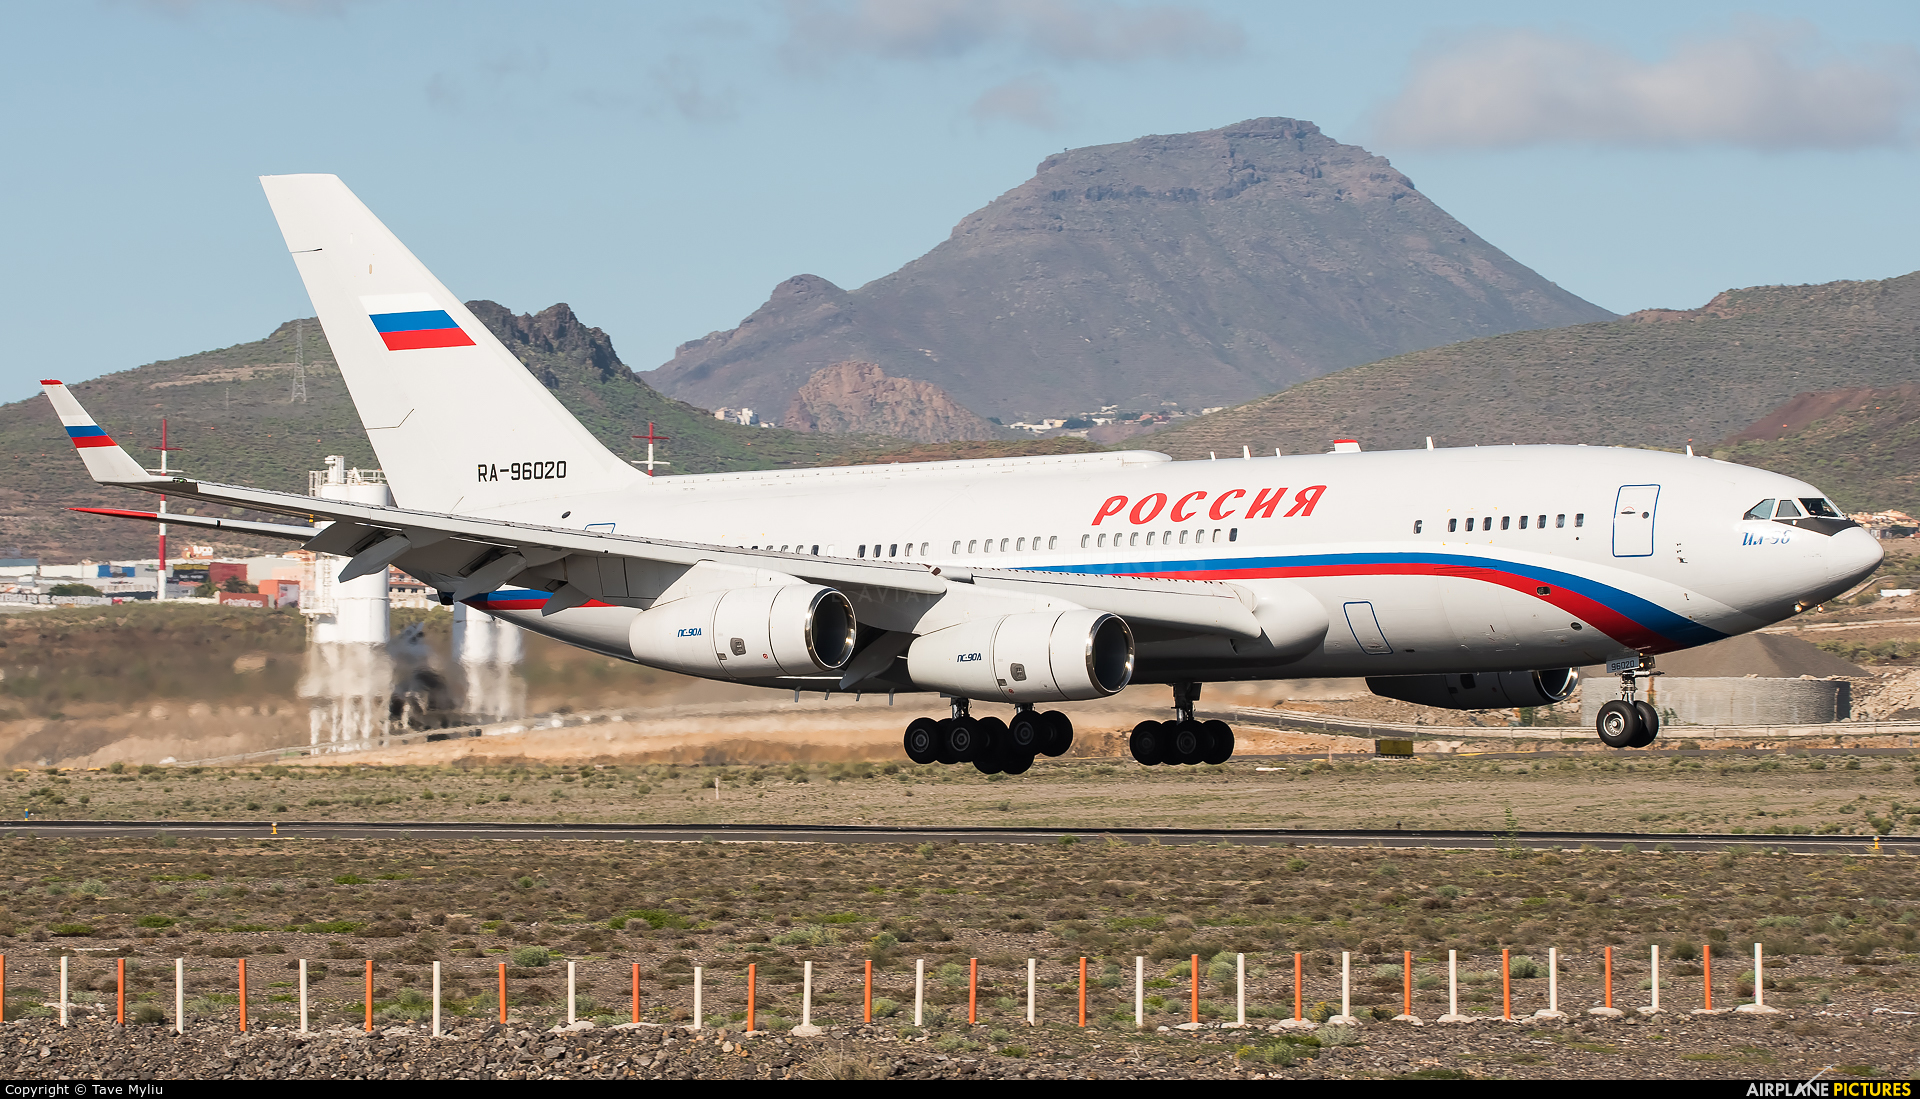 Rossiya RA-96020 aircraft at Tenerife Sur - Reina Sofia